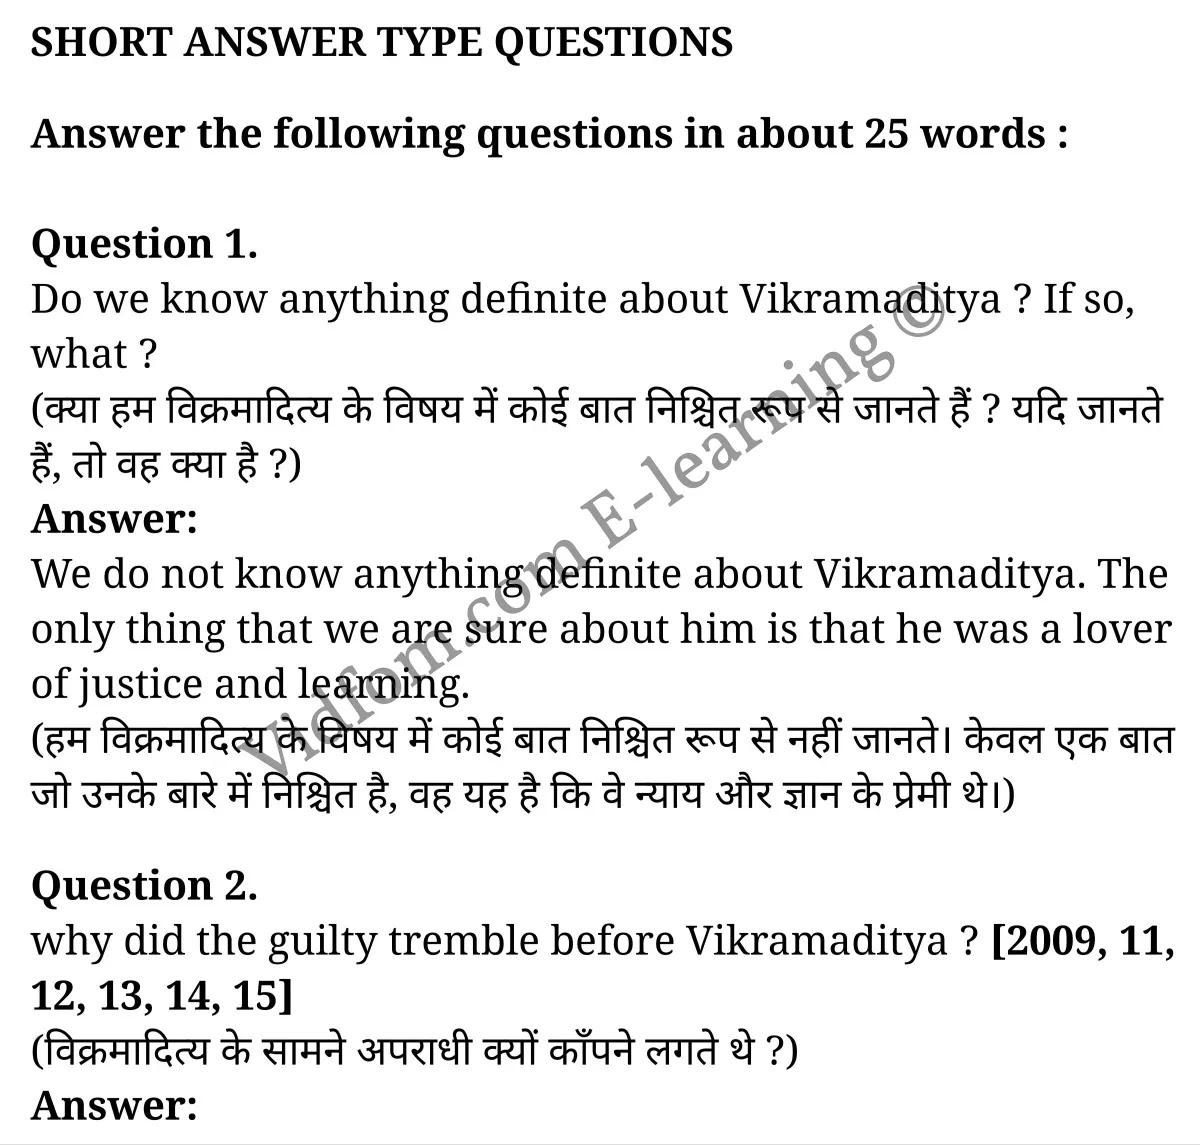 कक्षा 10 अंग्रेज़ी  के नोट्स  हिंदी में एनसीईआरटी समाधान,     class 10 English SUPPLEMENTARY chapter 2,   class 10 English SUPPLEMENTARY chapter 2 ncert solutions in English SUPPLEMENTARY,  class 10 English SUPPLEMENTARY chapter 2 notes in hindi,   class 10 English SUPPLEMENTARY chapter 2 question answer,   class 10 English SUPPLEMENTARY chapter 2 notes,   class 10 English SUPPLEMENTARY chapter 2 class 10 English SUPPLEMENTARY  chapter 2 in  hindi,    class 10 English SUPPLEMENTARY chapter 2 important questions in  hindi,   class 10 English SUPPLEMENTARY hindi  chapter 2 notes in hindi,   class 10 English SUPPLEMENTARY  chapter 2 test,   class 10 English SUPPLEMENTARY  chapter 2 class 10 English SUPPLEMENTARY  chapter 2 pdf,   class 10 English SUPPLEMENTARY  chapter 2 notes pdf,   class 10 English SUPPLEMENTARY  chapter 2 exercise solutions,  class 10 English SUPPLEMENTARY  chapter 2,  class 10 English SUPPLEMENTARY  chapter 2 notes study rankers,  class 10 English SUPPLEMENTARY  chapter 2 notes,   class 10 English SUPPLEMENTARY hindi  chapter 2 notes,    class 10 English SUPPLEMENTARY   chapter 2  class 10  notes pdf,  class 10 English SUPPLEMENTARY  chapter 2 class 10  notes  ncert,  class 10 English SUPPLEMENTARY  chapter 2 class 10 pdf,   class 10 English SUPPLEMENTARY  chapter 2  book,   class 10 English SUPPLEMENTARY  chapter 2 quiz class 10  ,   कक्षा 10 द जैजमेंट-सीट ए विक्रमादित्य,  कक्षा 10 द जैजमेंट-सीट ए विक्रमादित्य  के नोट्स हिंदी में,  कक्षा 10 द जैजमेंट-सीट ए विक्रमादित्य प्रश्न उत्तर,  कक्षा 10 द जैजमेंट-सीट ए विक्रमादित्य के नोट्स,  10 कक्षा द जैजमेंट-सीट ए विक्रमादित्य  हिंदी में, कक्षा 10 द जैजमेंट-सीट ए विक्रमादित्य  हिंदी में,  कक्षा 10 द जैजमेंट-सीट ए विक्रमादित्य  महत्वपूर्ण प्रश्न हिंदी में, कक्षा 10 हिंदी के नोट्स  हिंदी में, द जैजमेंट-सीट ए विक्रमादित्य हिंदी में कक्षा 10 नोट्स pdf,    द जैजमेंट-सीट ए विक्रमादित्य हिंदी में  कक्षा 10 नोट्स 2021 ncert,   द जैजमेंट-सीट ए विक्रमादित्य हिंदी  कक्षा 10 pdf,   द जैजमेंट-सीट ए विक्रमादित्य हिंदी 